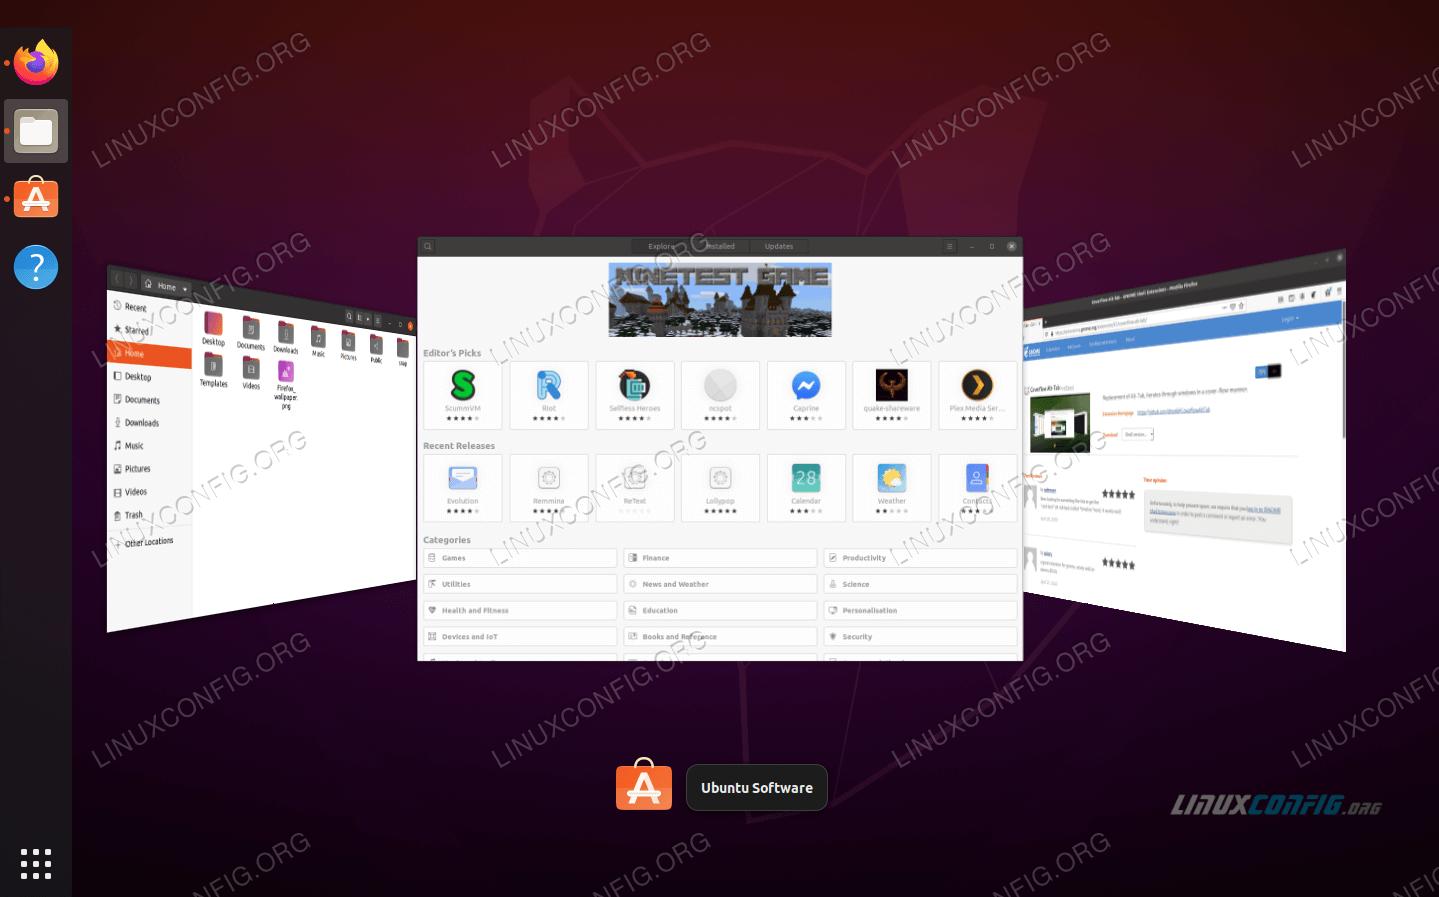 GNOME extensions on Ubuntu 20.04 Focal Fossa